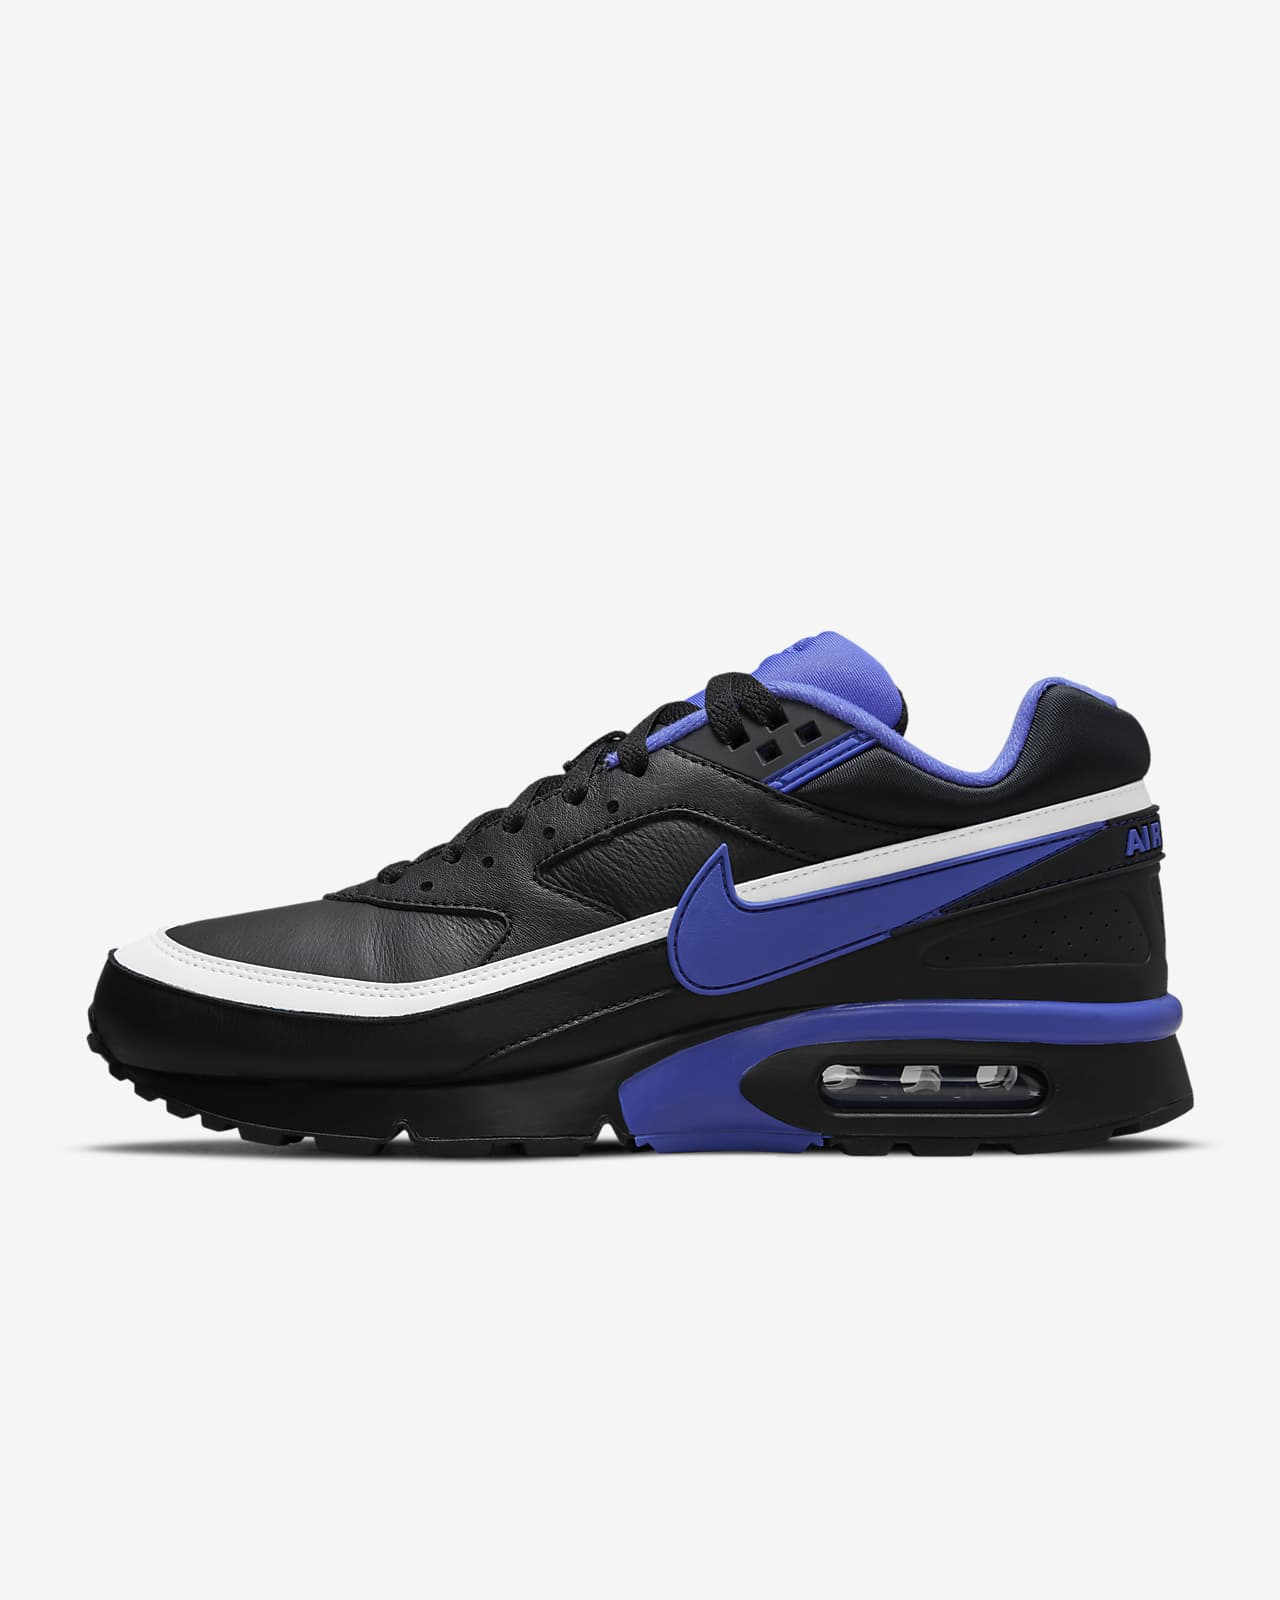 Nike Air Max BW OG Men's Shoes